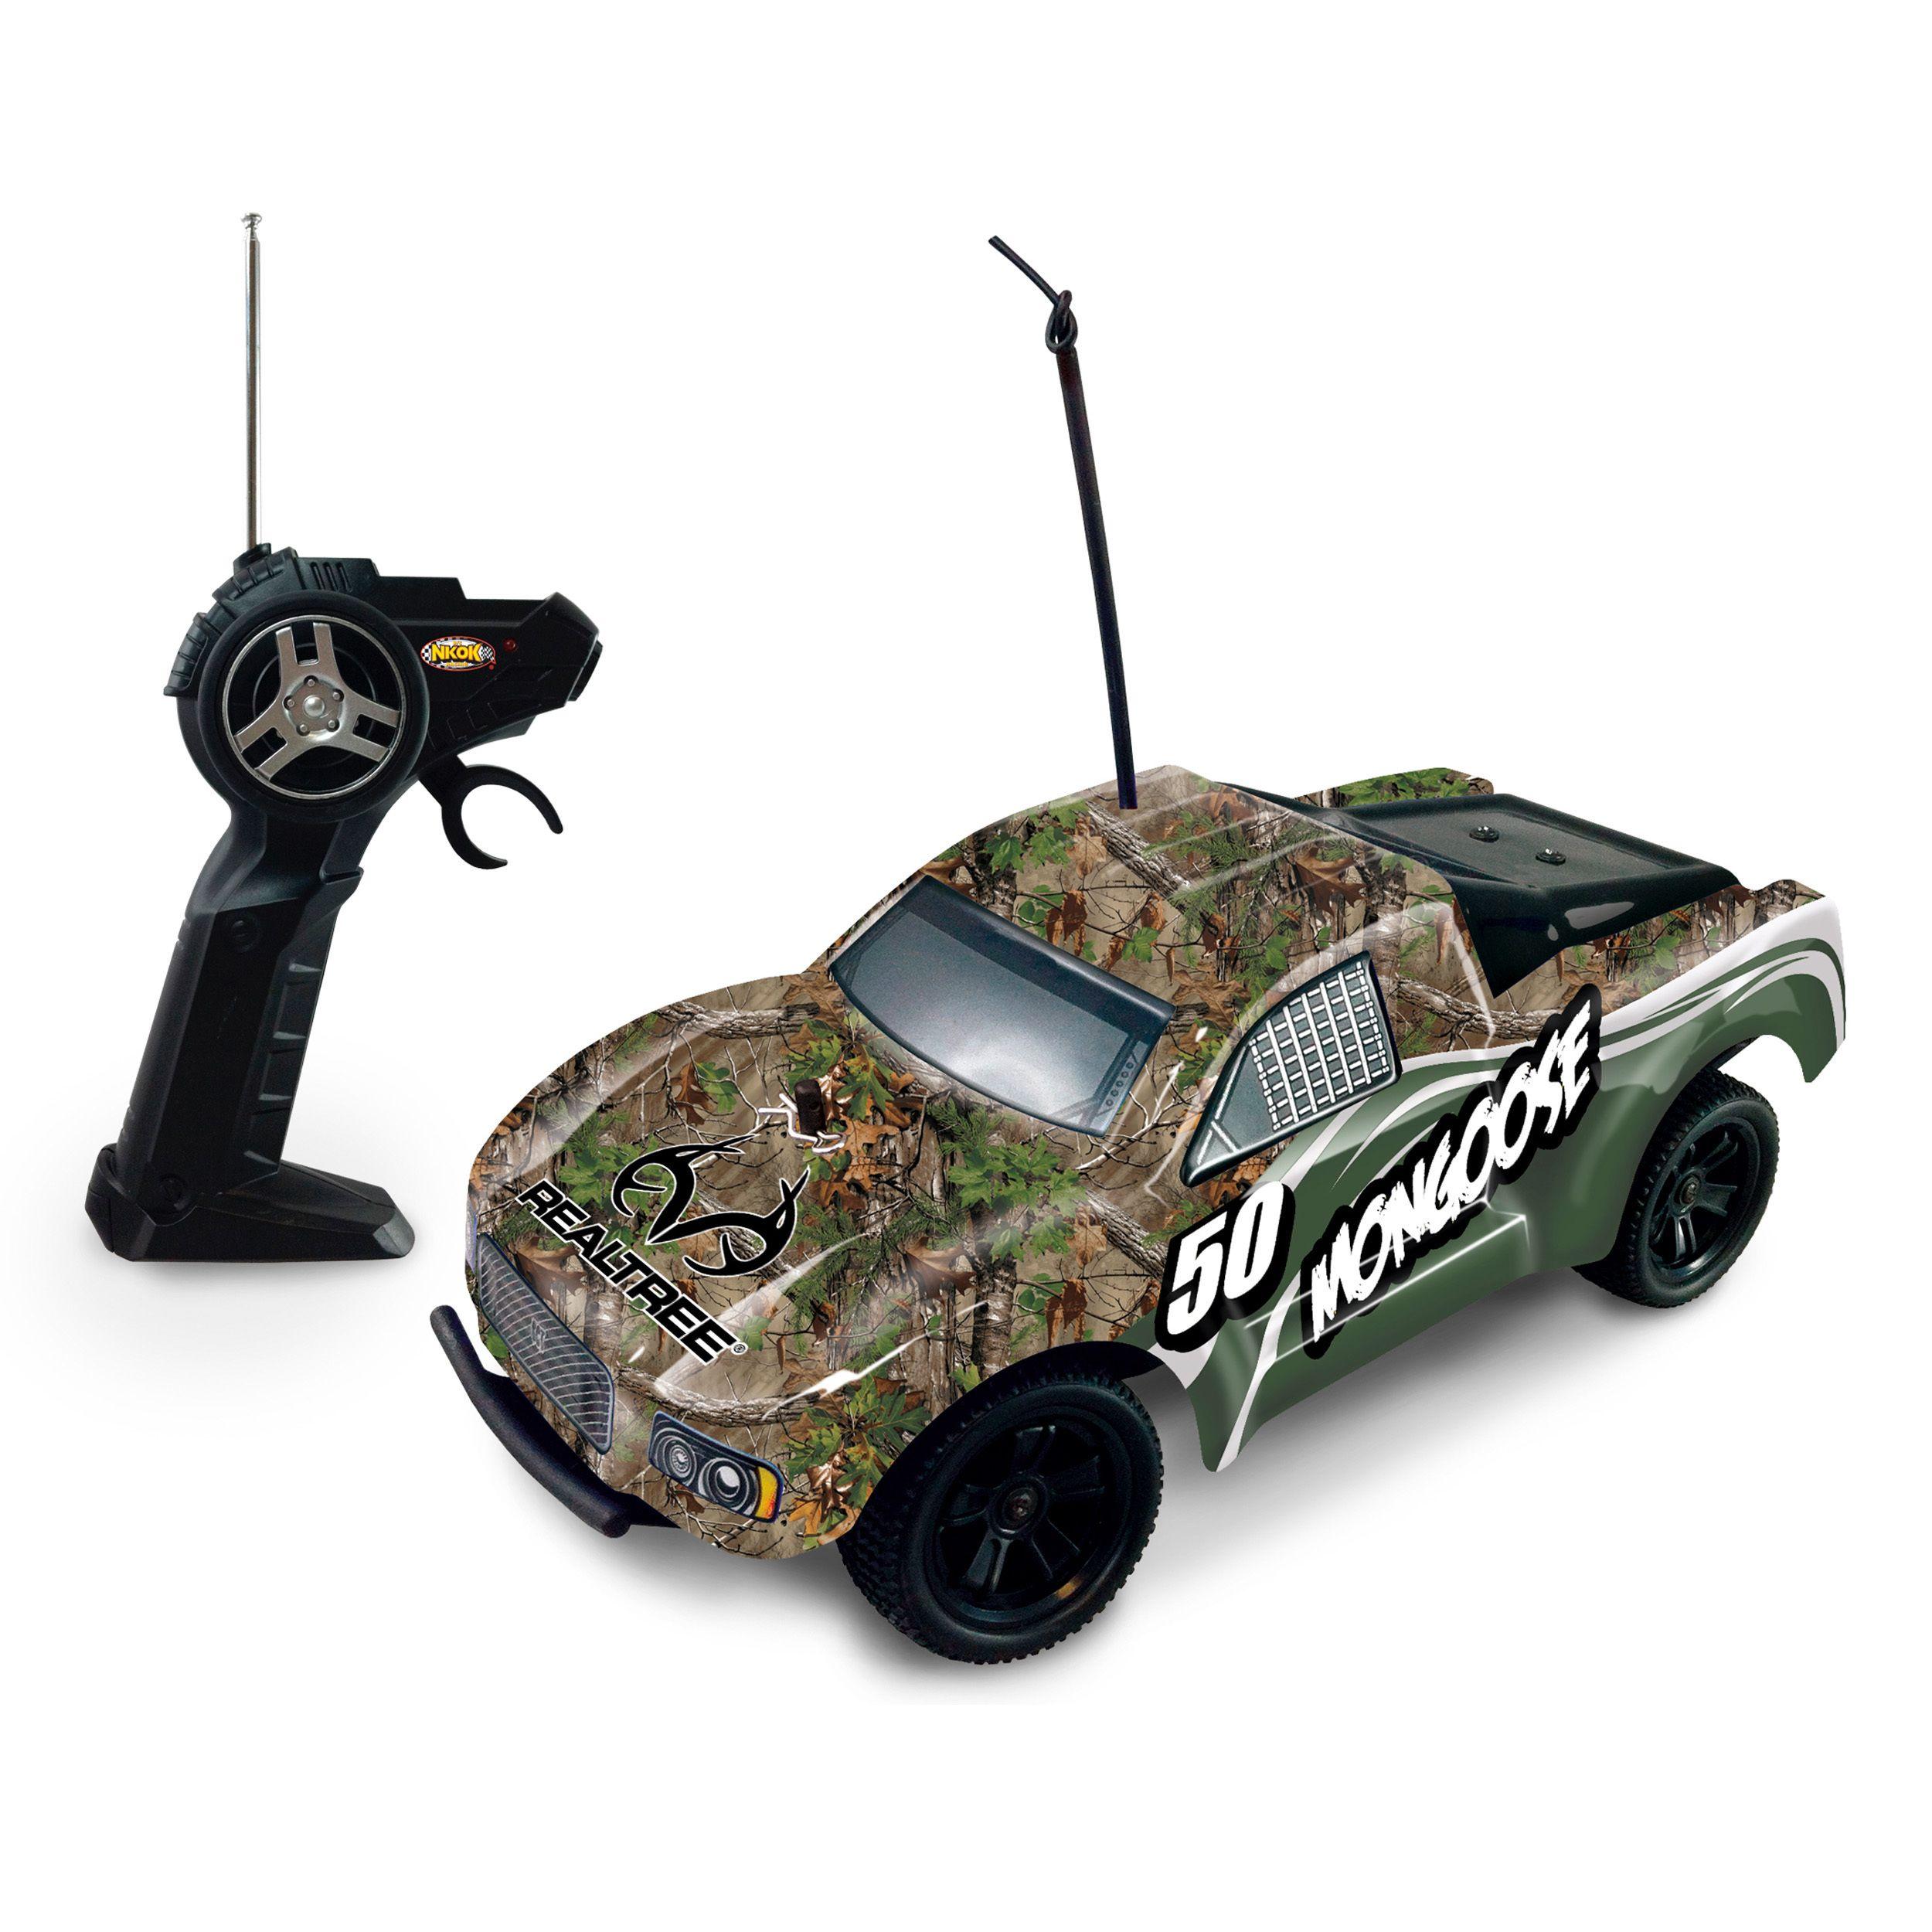 Nkok RealTree Camo Mongoose 1 16 Remote Control Car